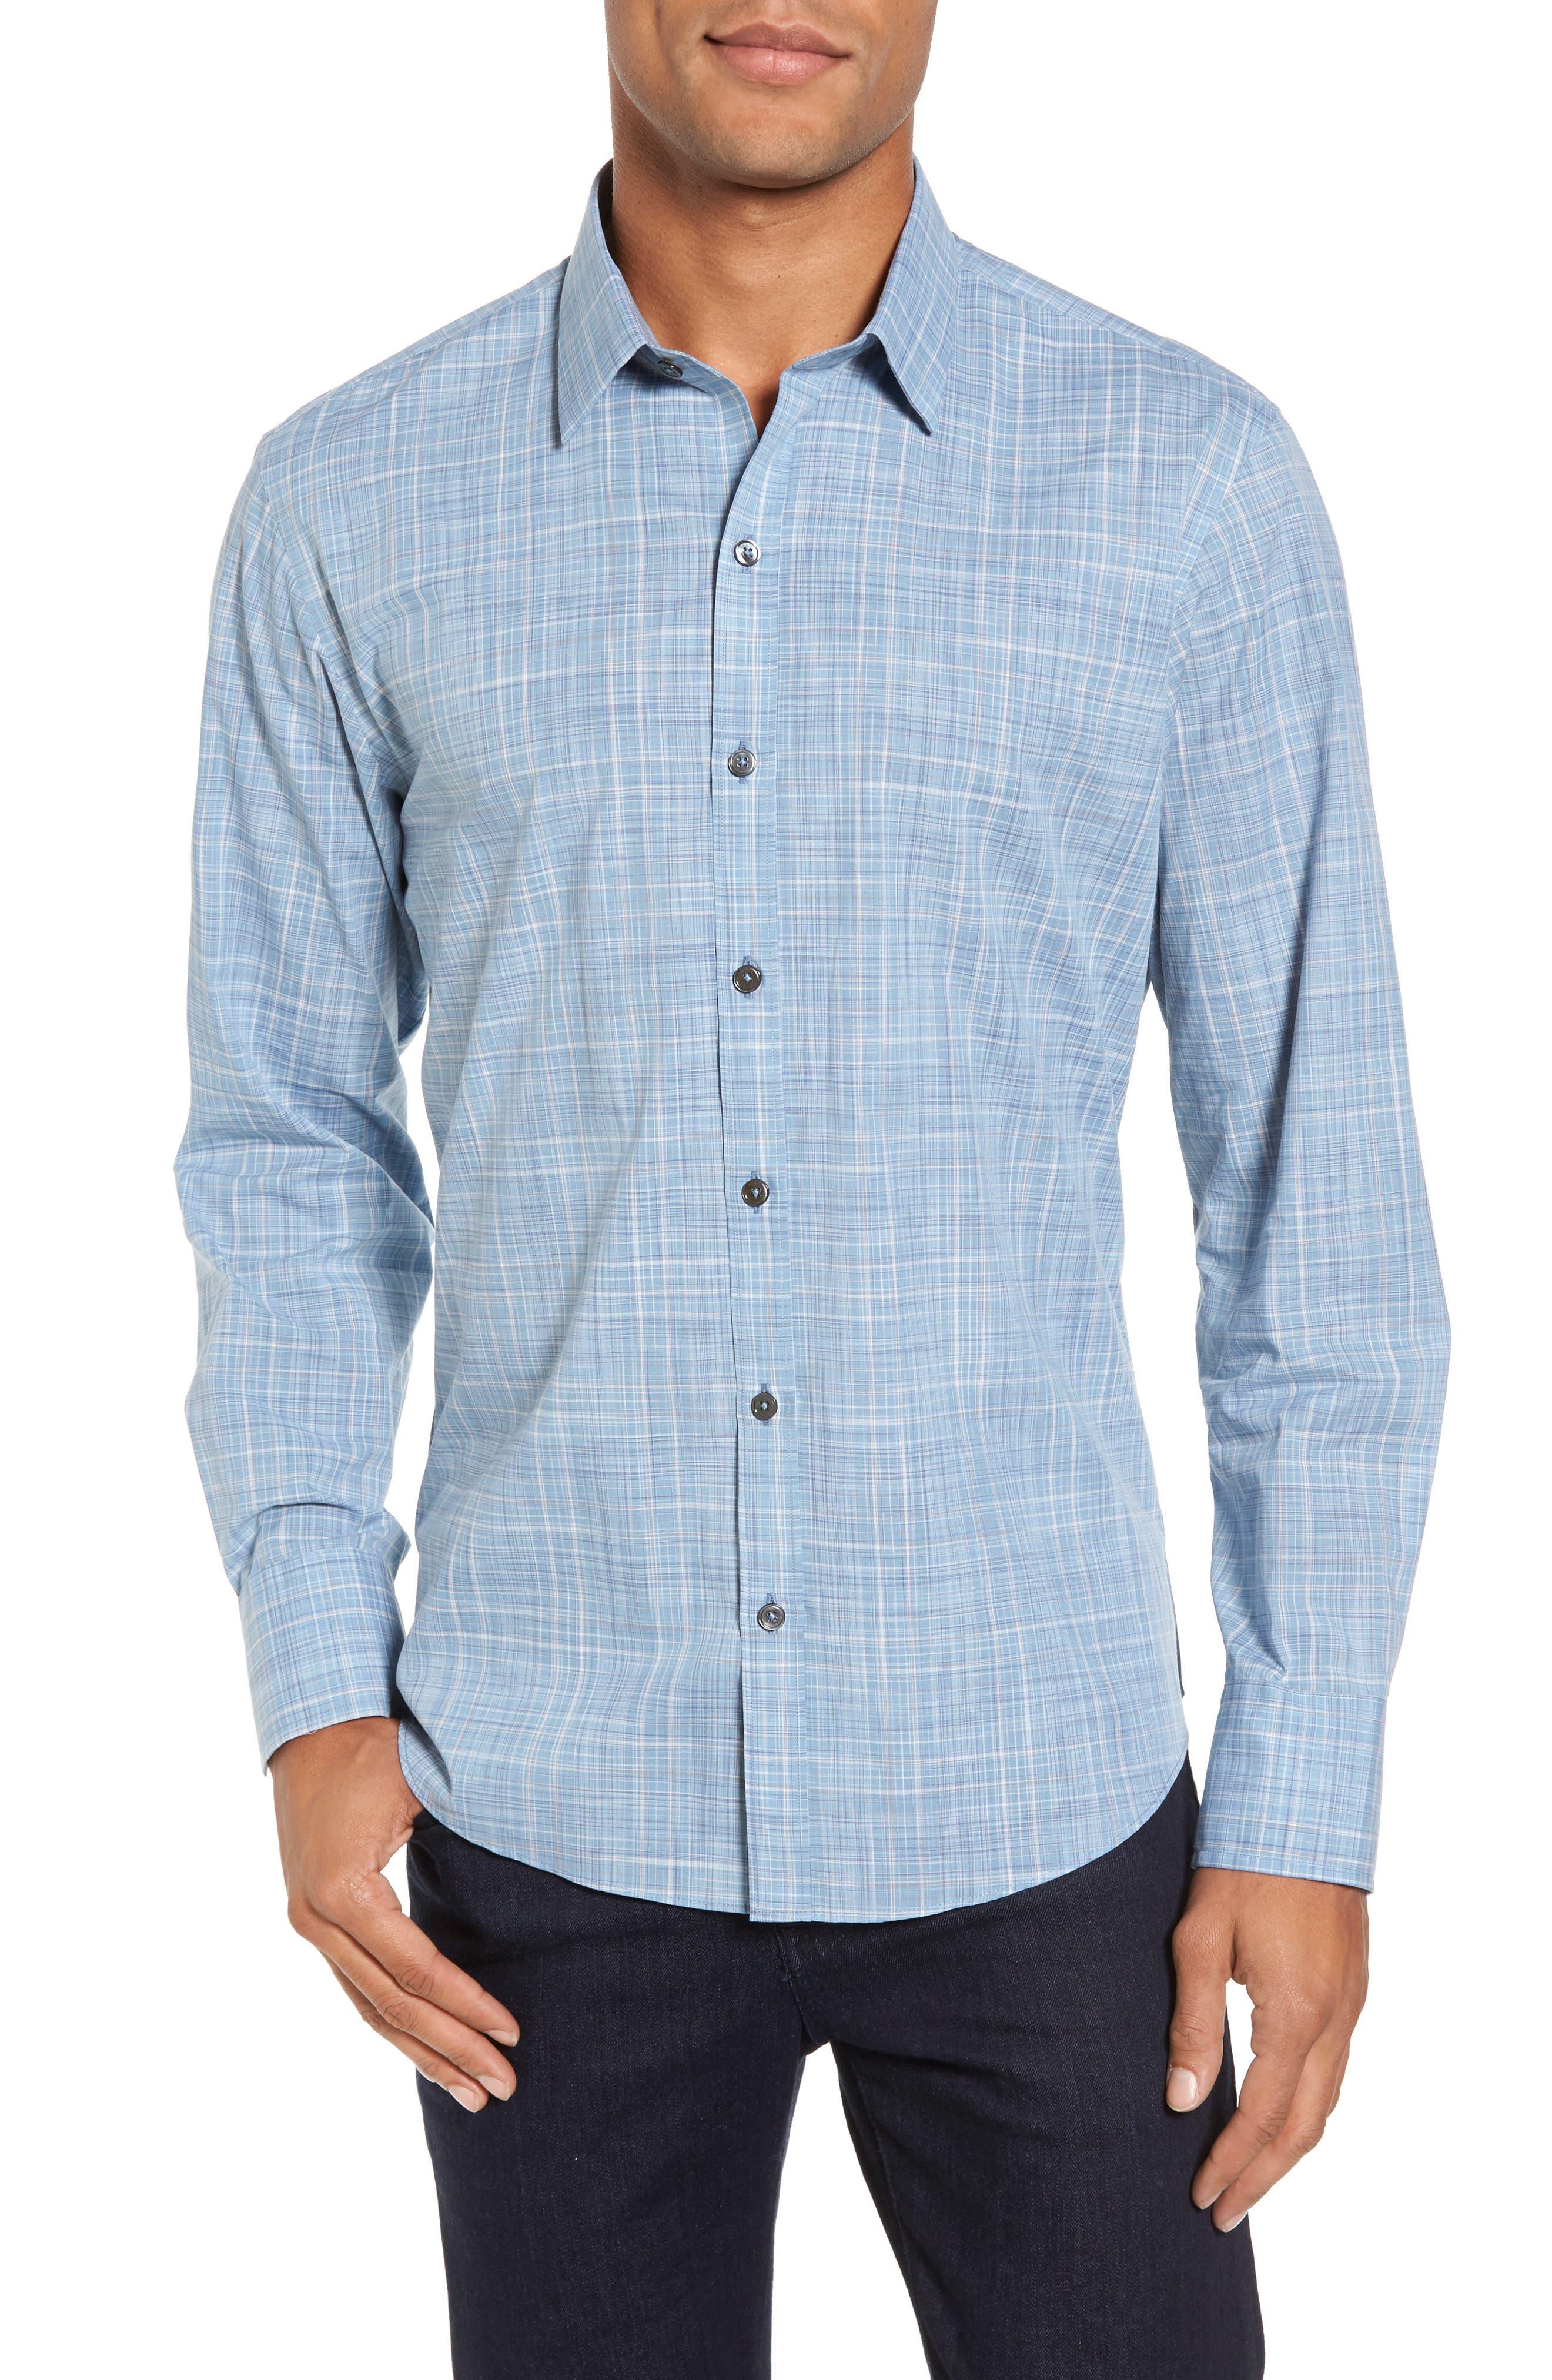 Alternate Image 1 Selected - Zachary Prell Clark Slim Fit Plaid Sport Shirt